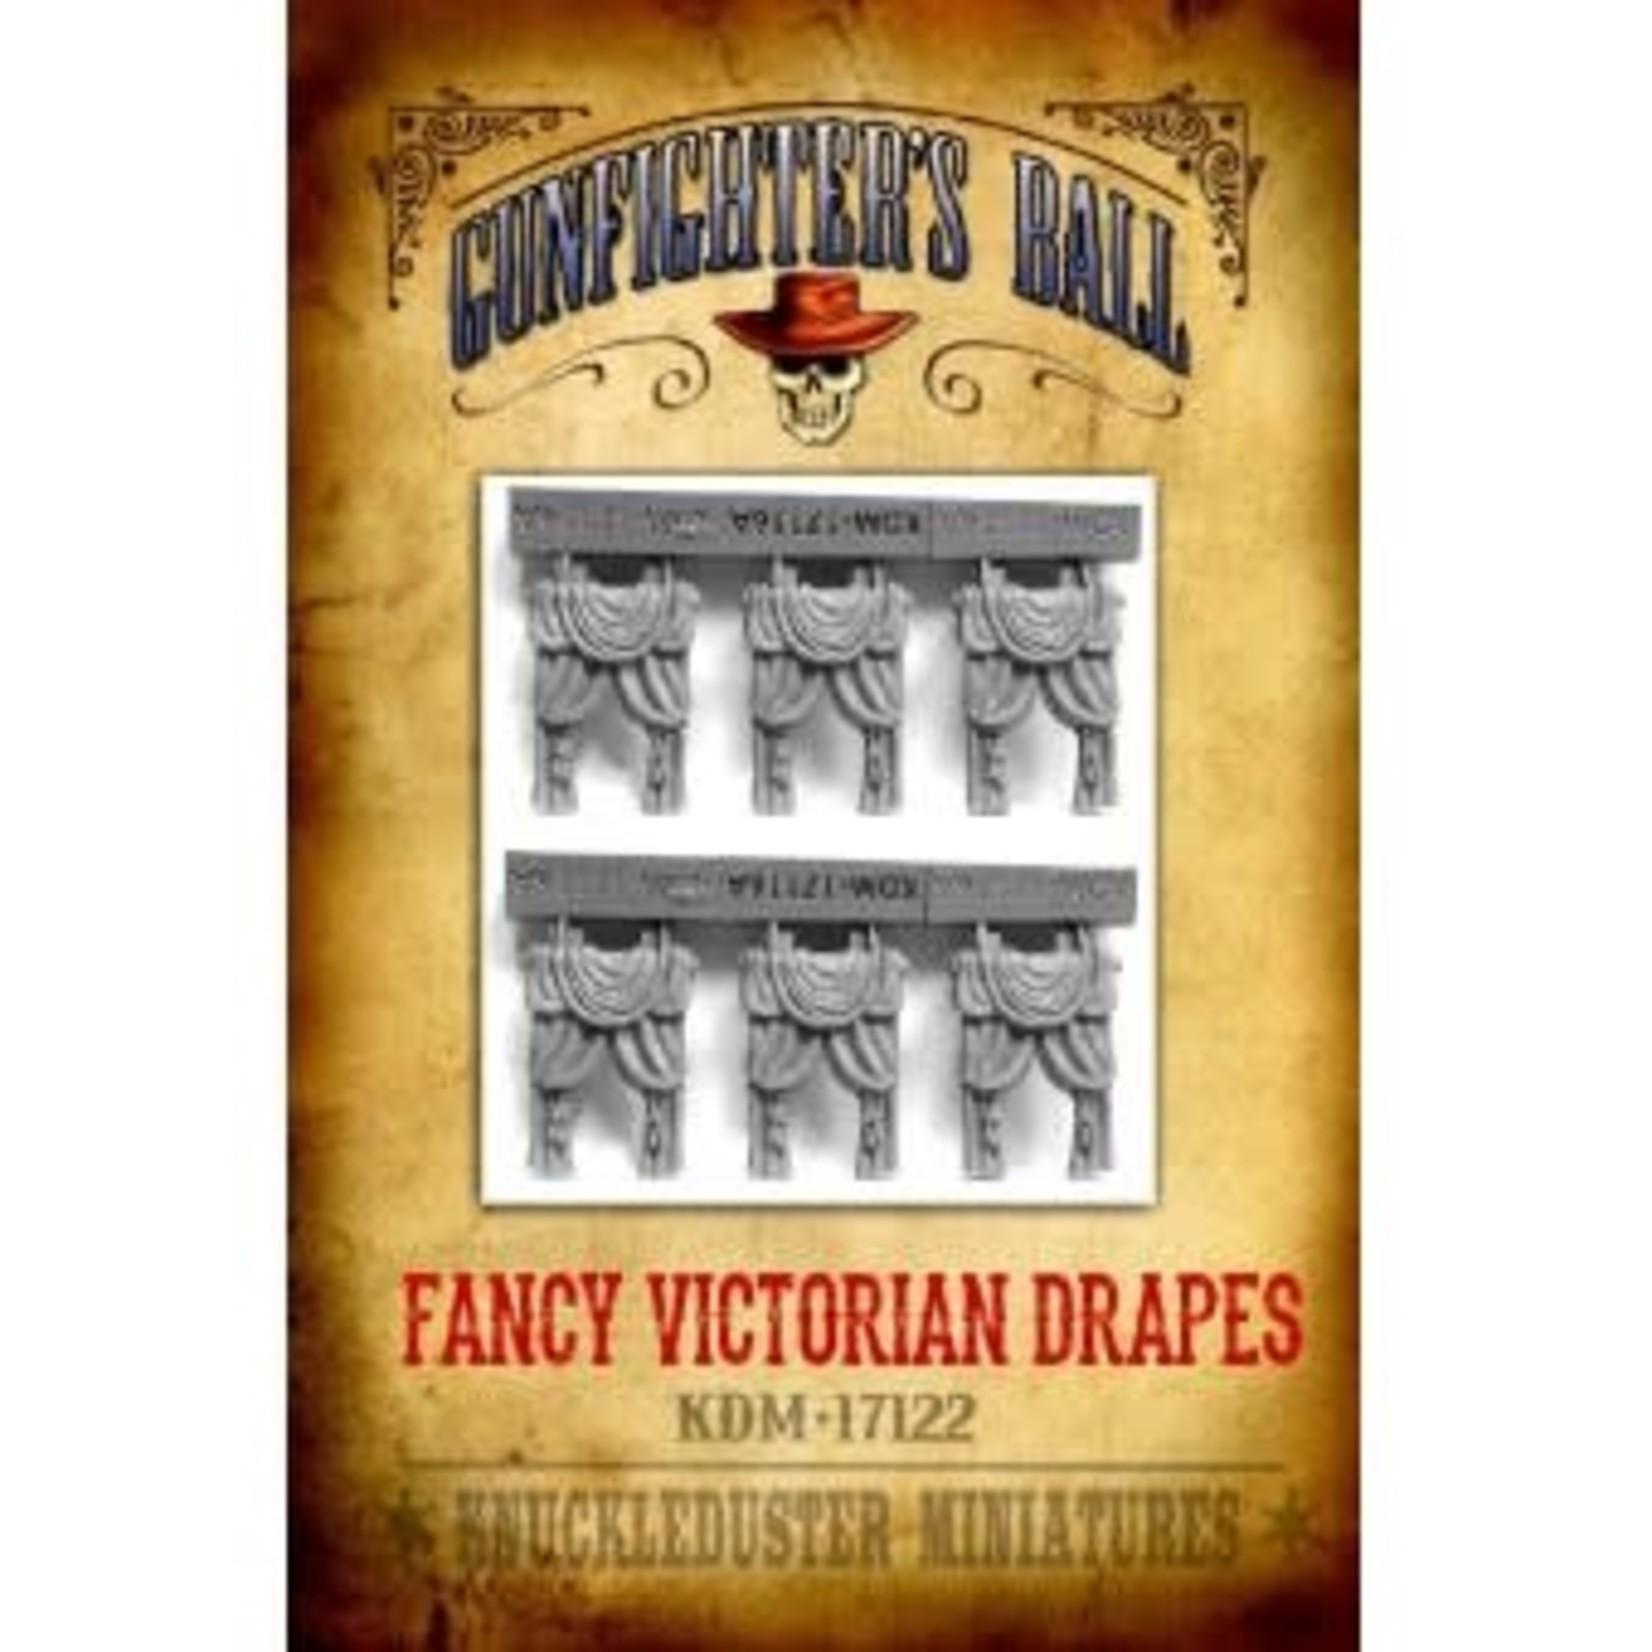 Fancy Victorian Drapes